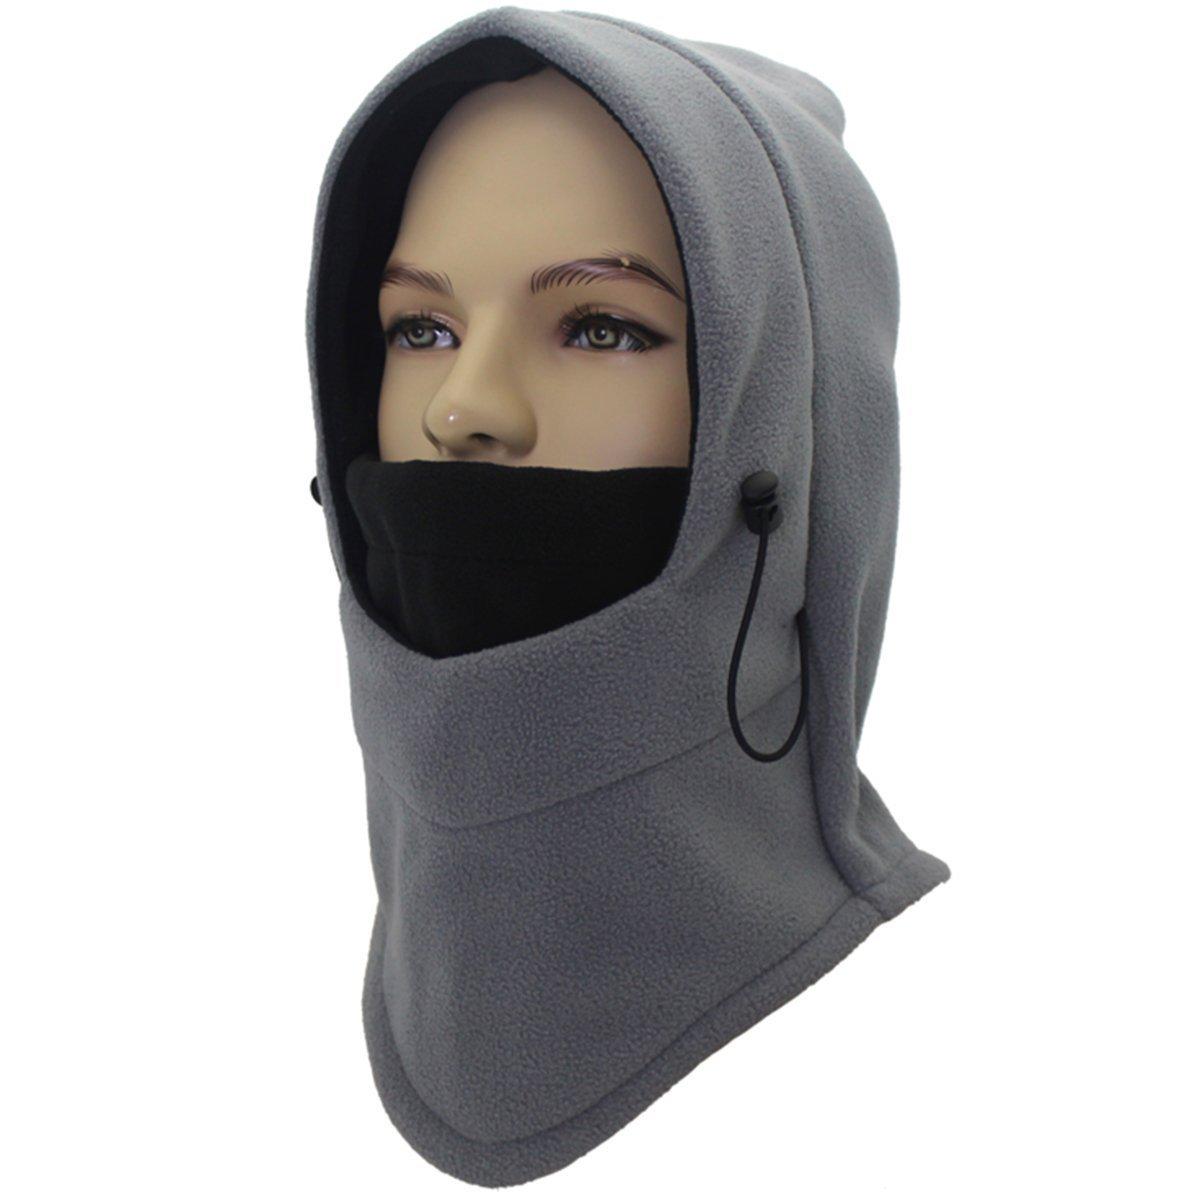 Miracu Heavyweight Balaclava Windproof Ski Face Mask Winter Fleece Hat/Hood Outdoor for Men, Women and Children ,Gray & Black,One Size